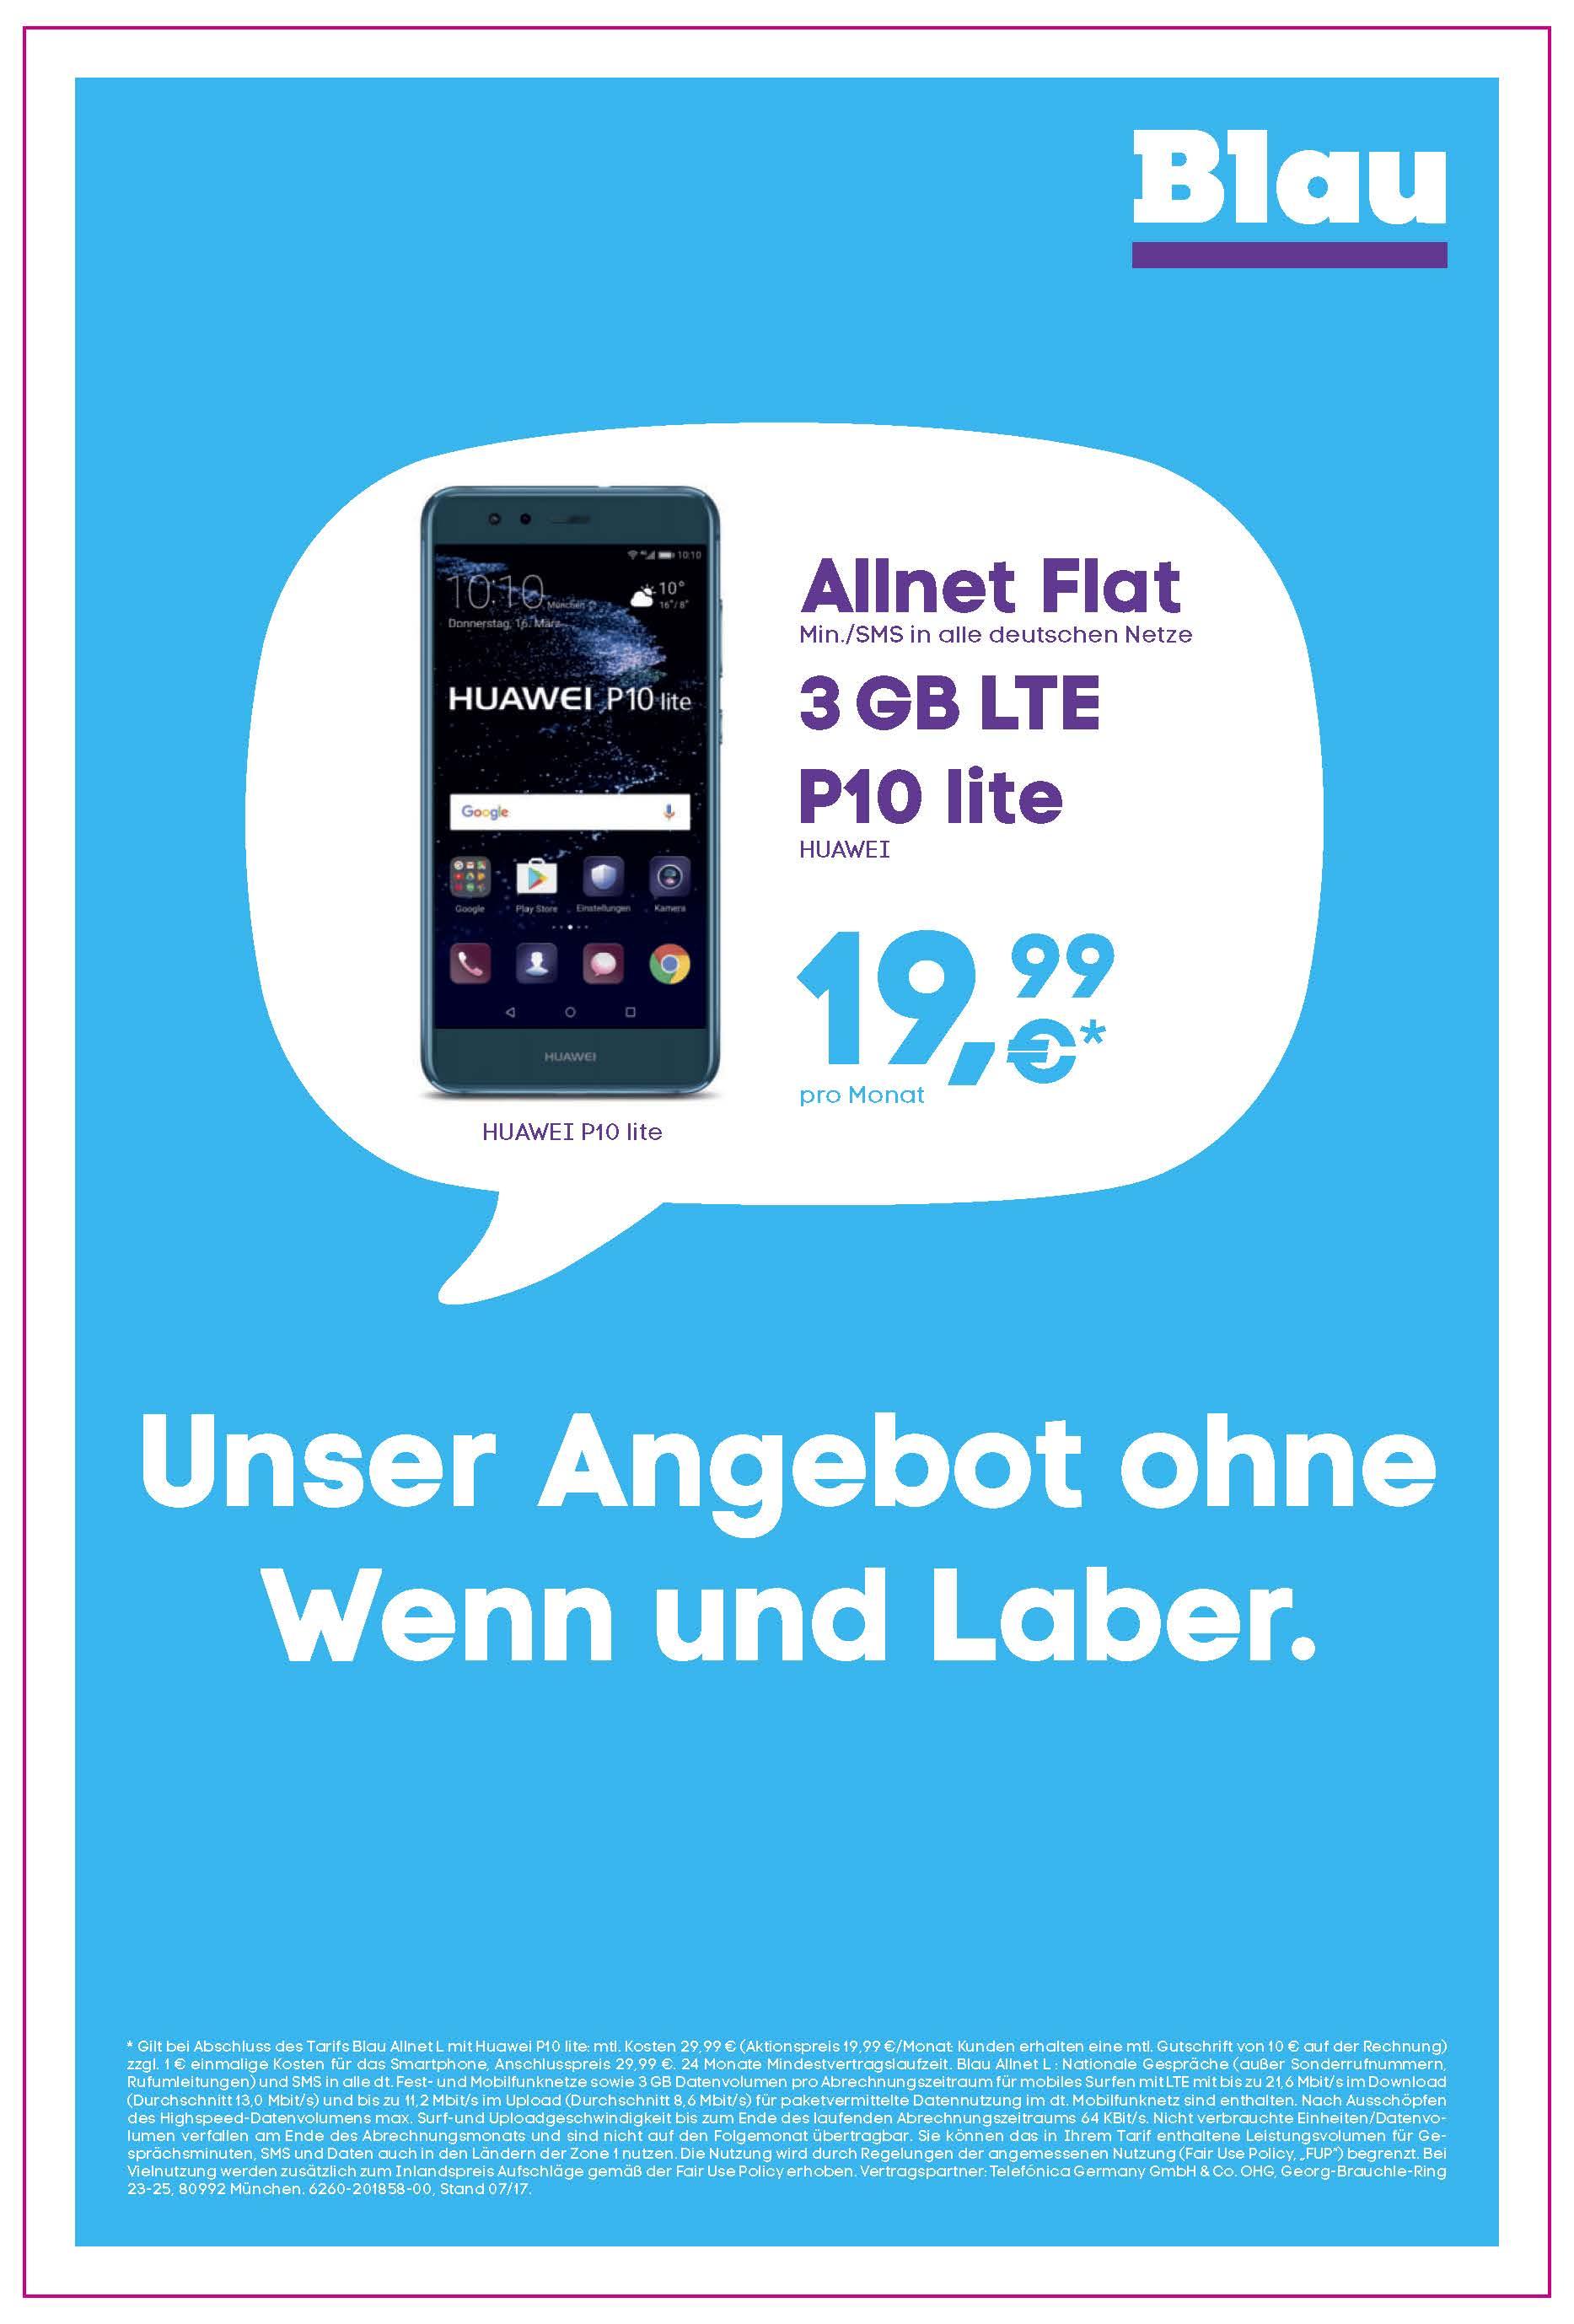 BLAU_OoH_Allnetflat_Huawei_P10_lite_CLP_M1730001_F39_150dpi_netto[1]_Seite_2.jpg